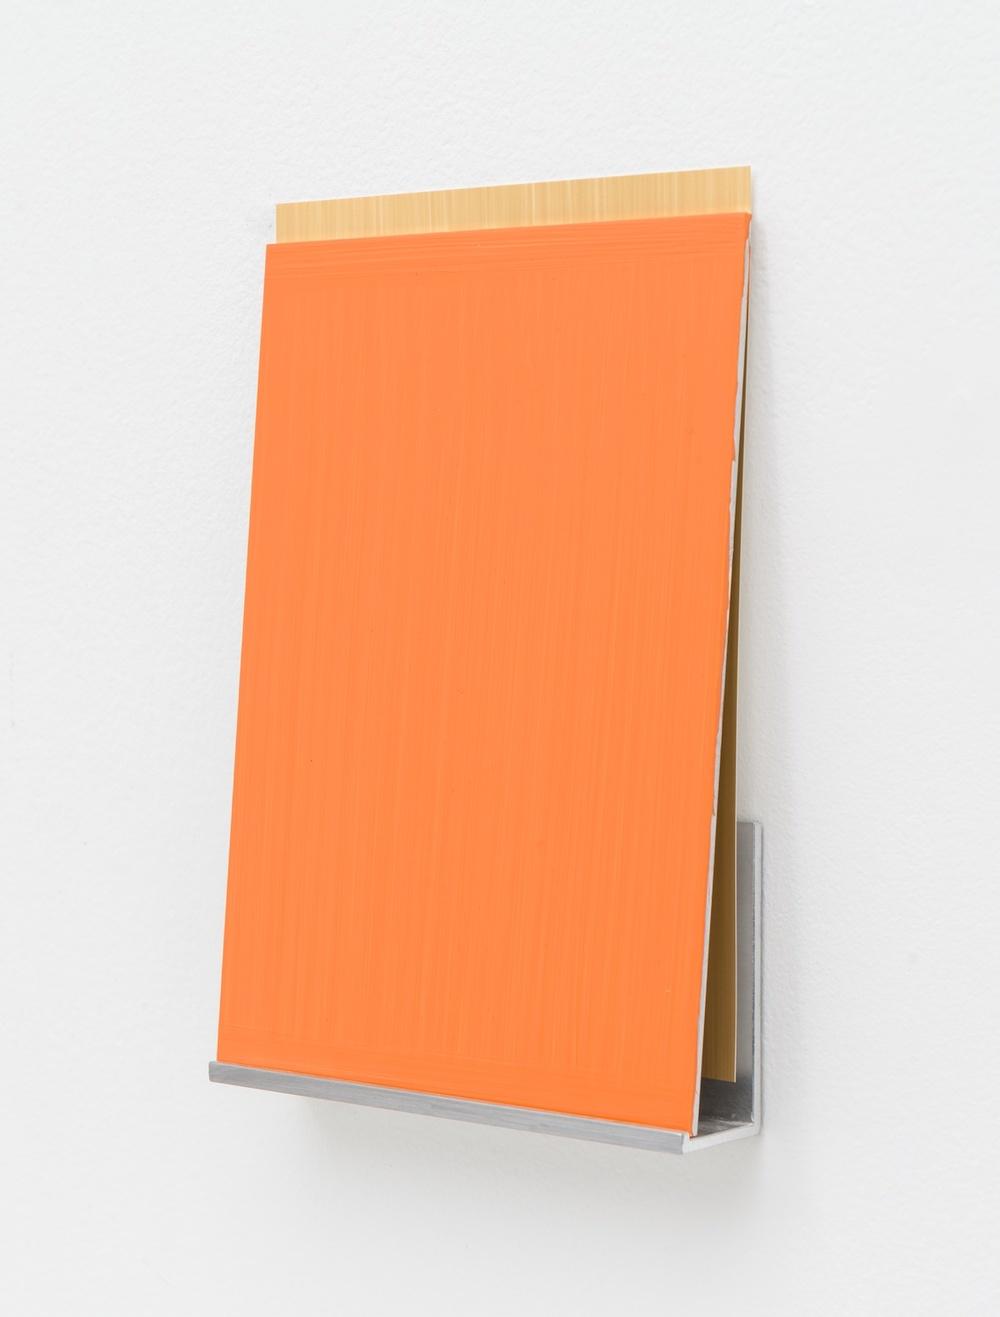 Imi Knoebel  An Meine Grüne Seite B 12-4  2012 Acrylic on aluminum, acrylic on plastic film, aluminum shelf 7 ⅞h x 5 ½w x 1 ⅛d in  IK005